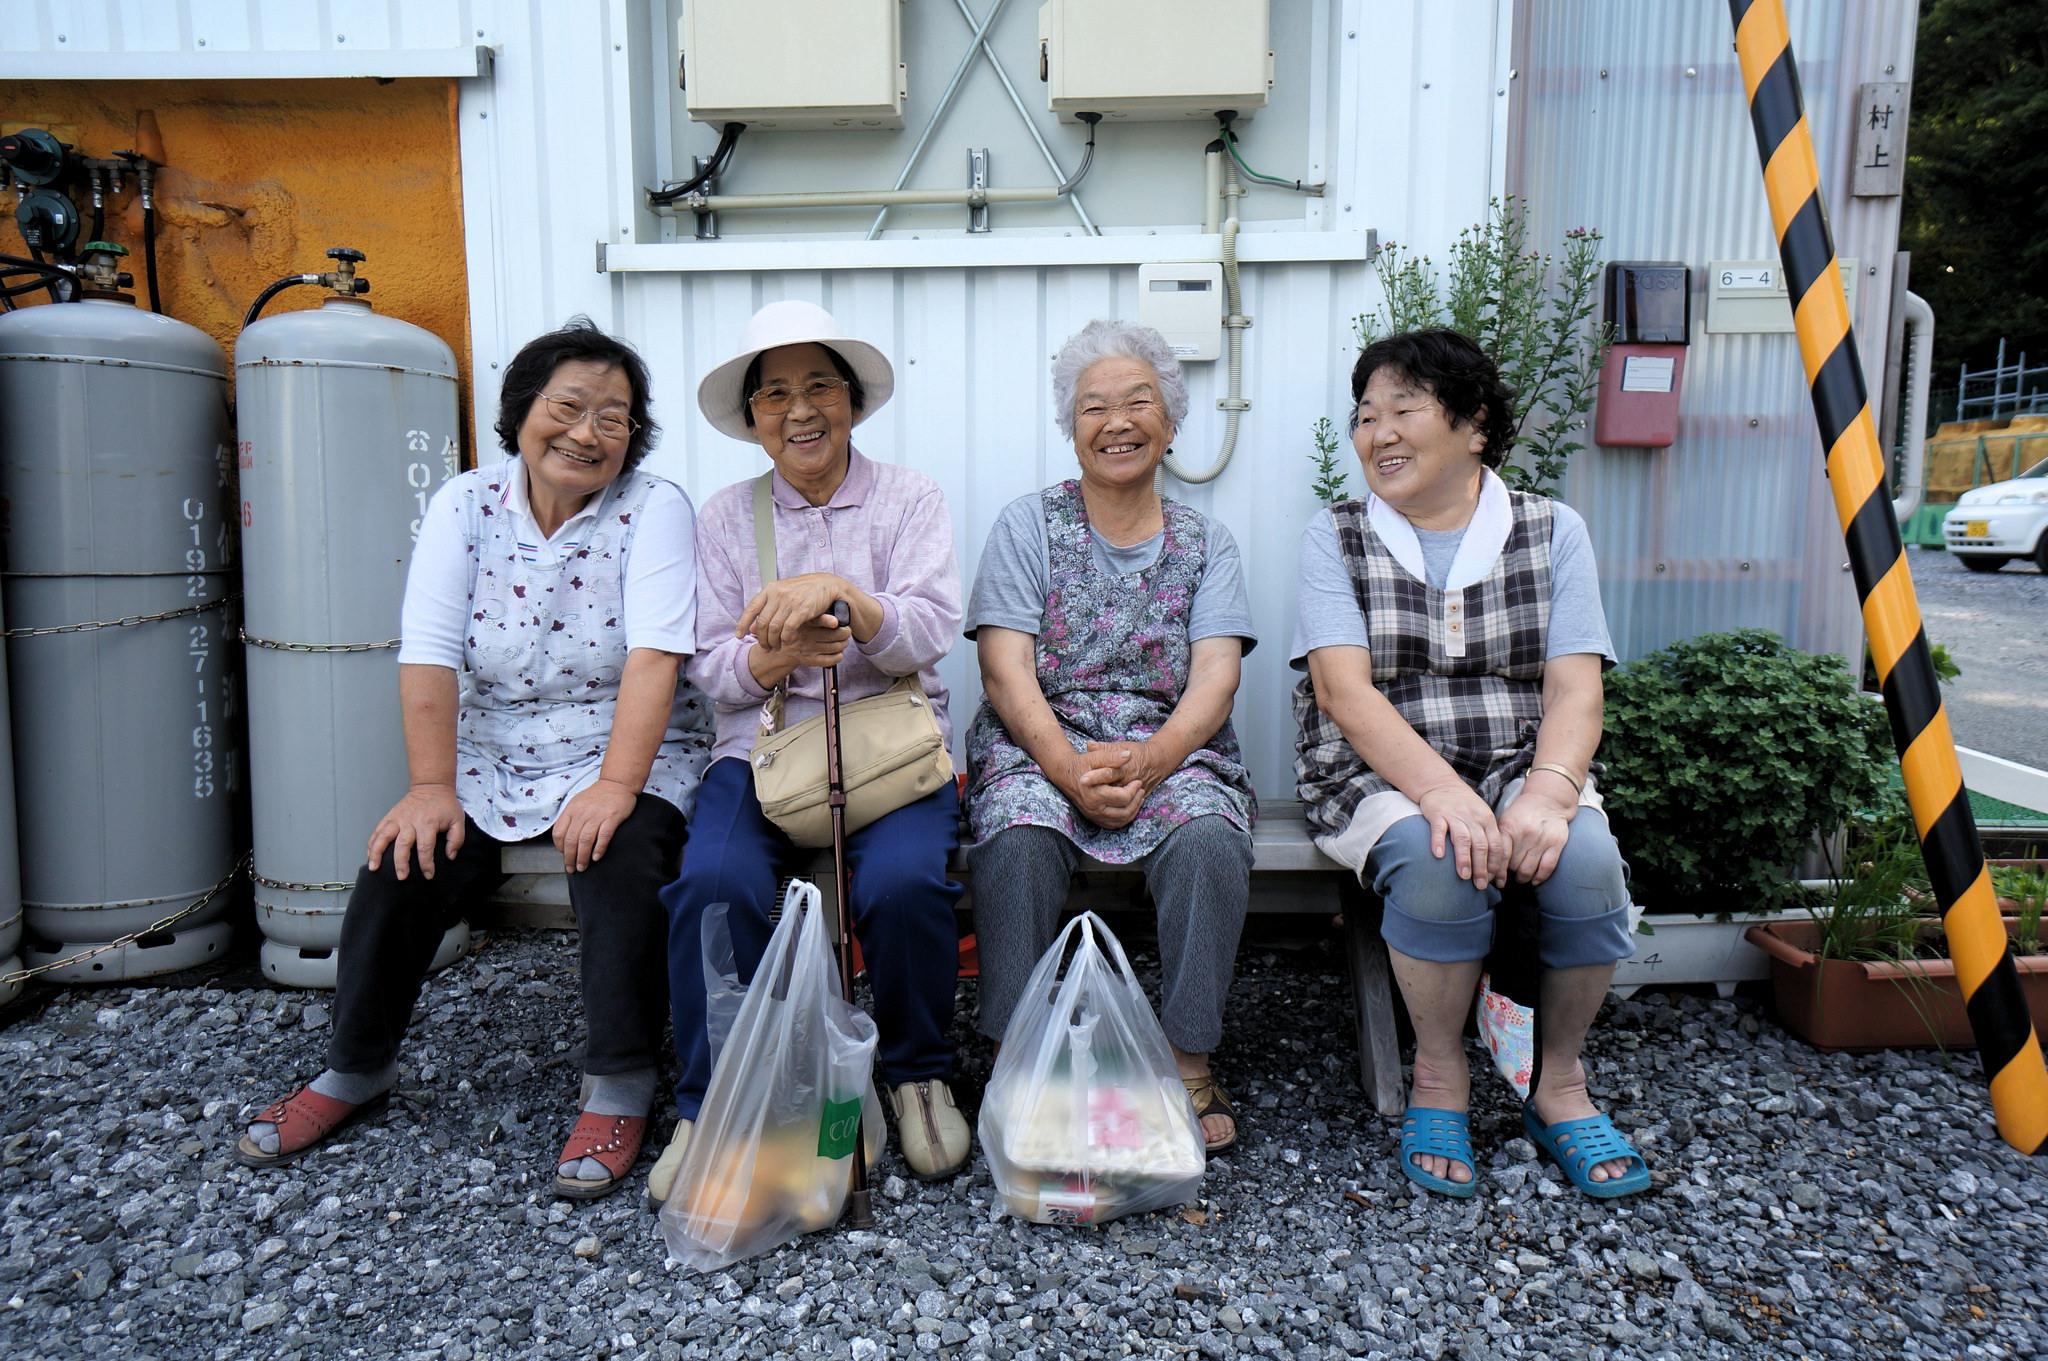 an image of japanese elderly women